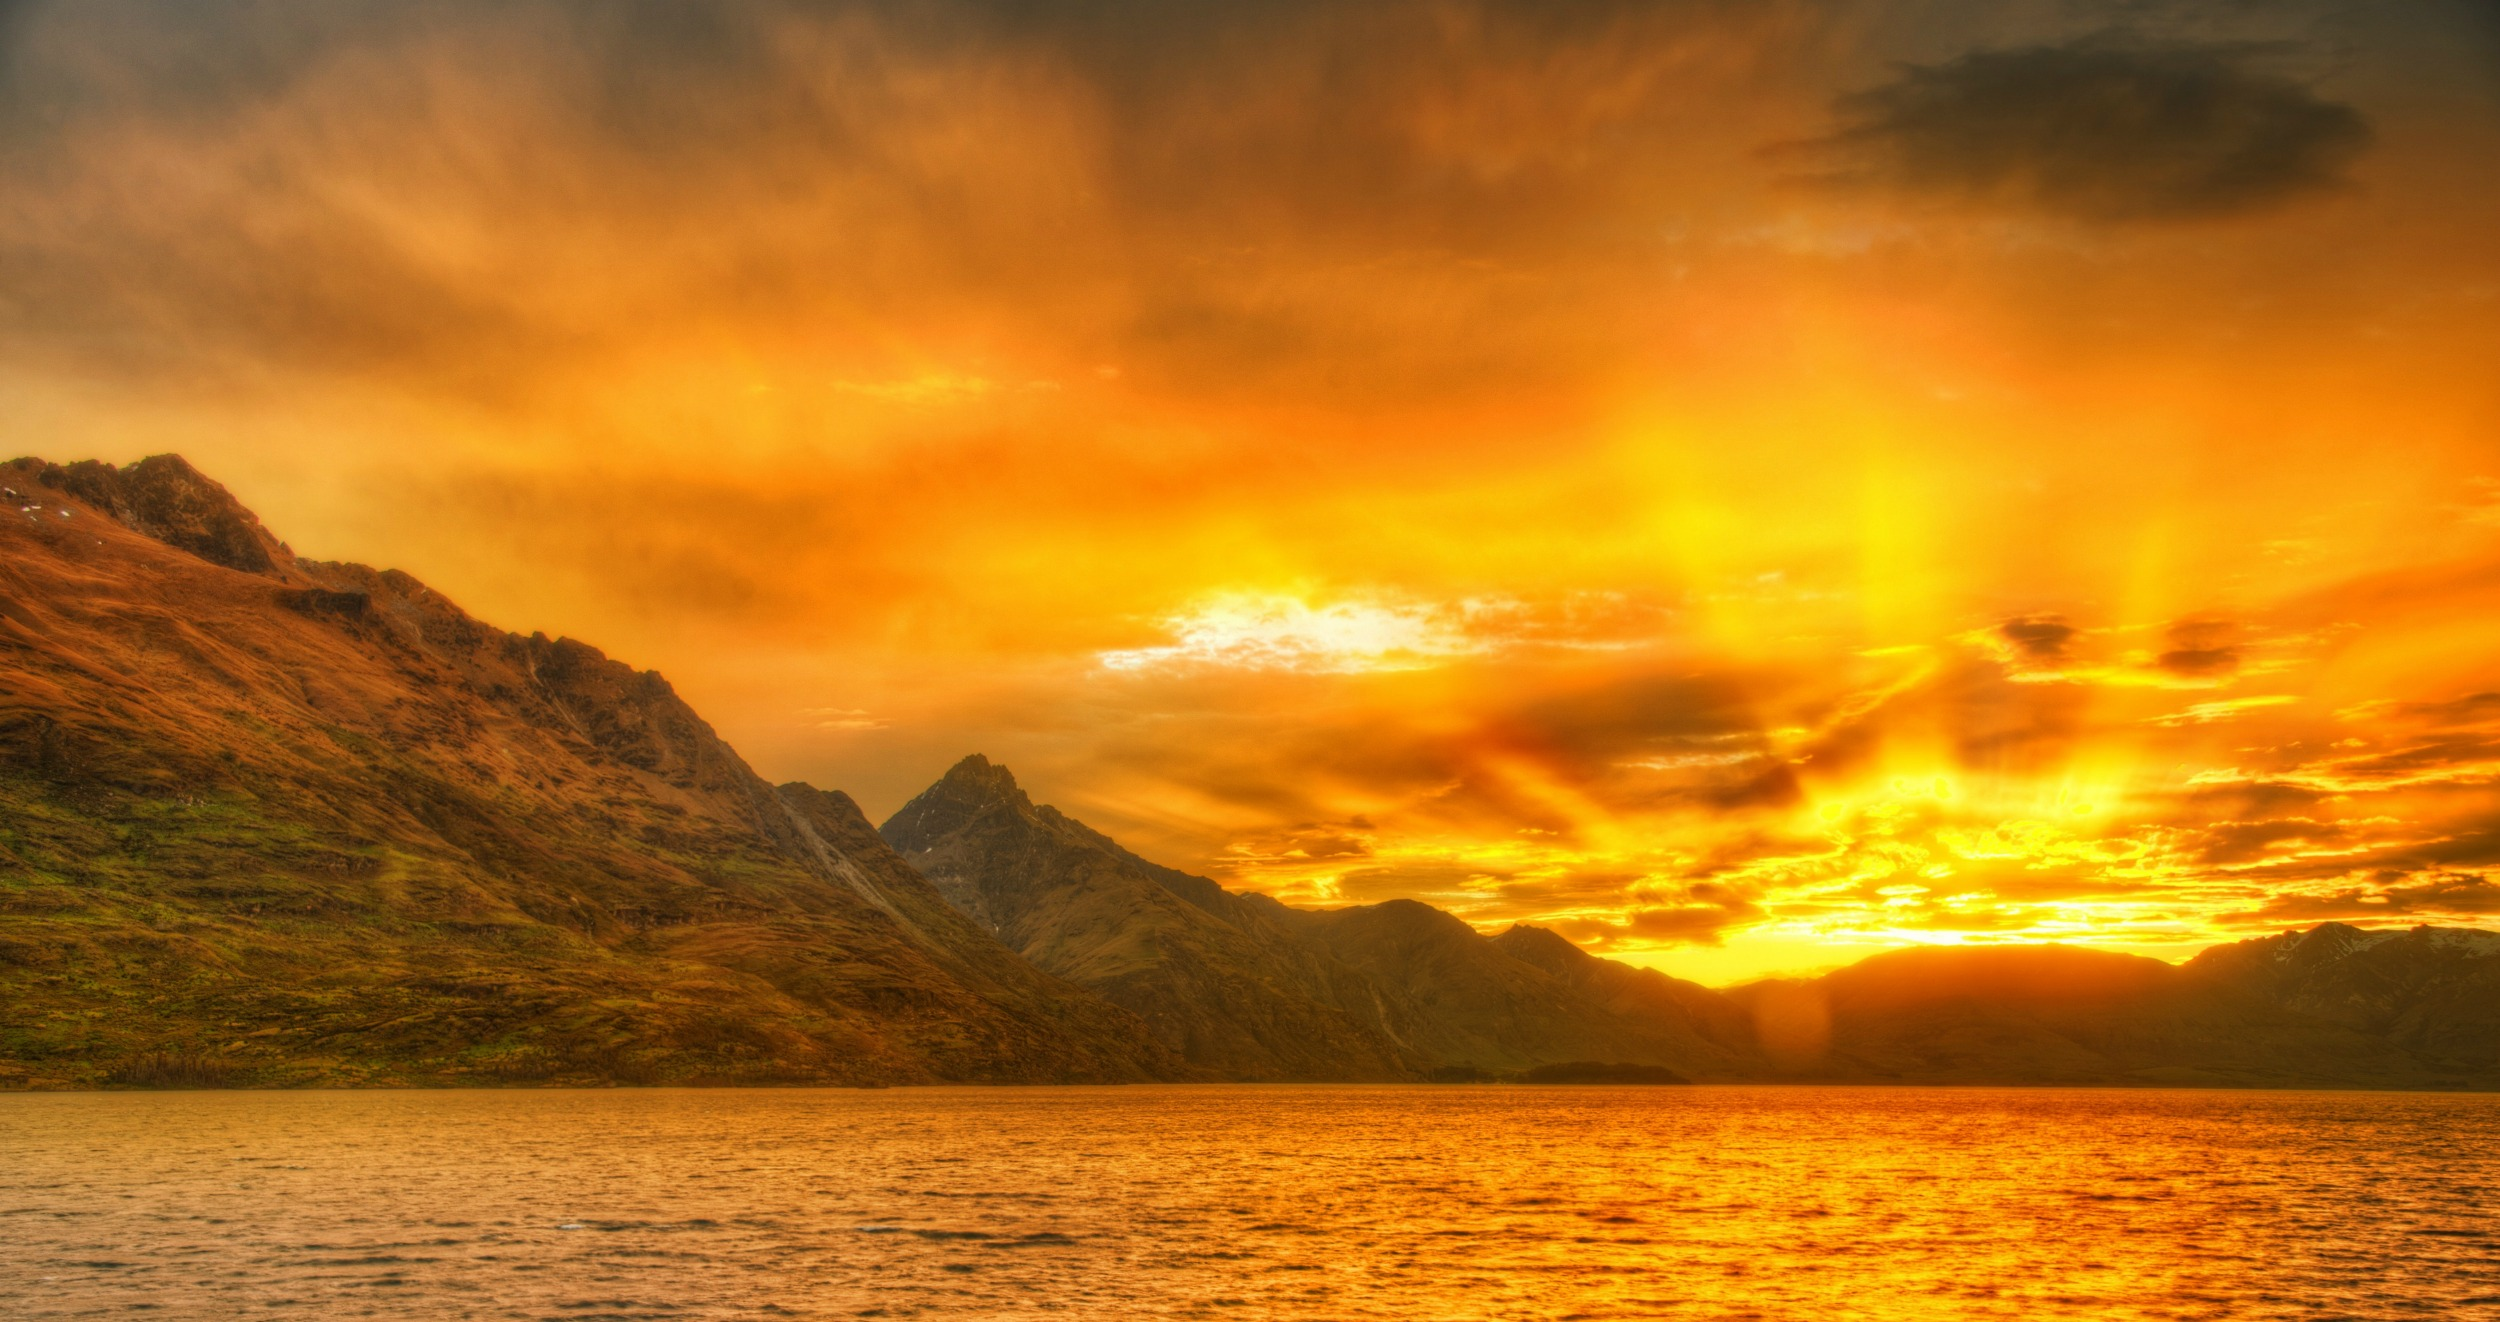 La leggenda Maori del Lago Wakatipu